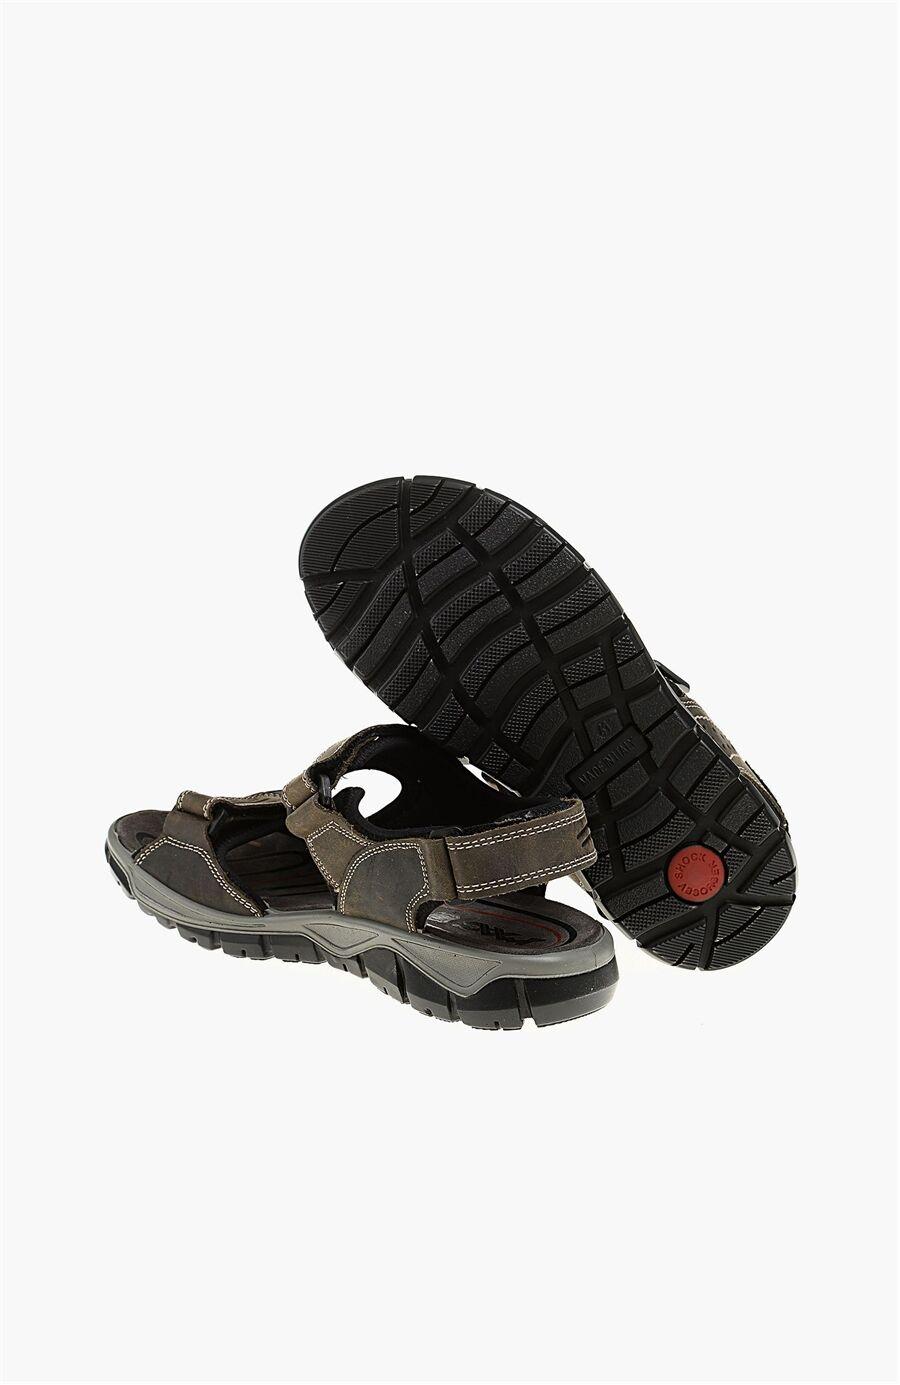 Antrasit Sandalet